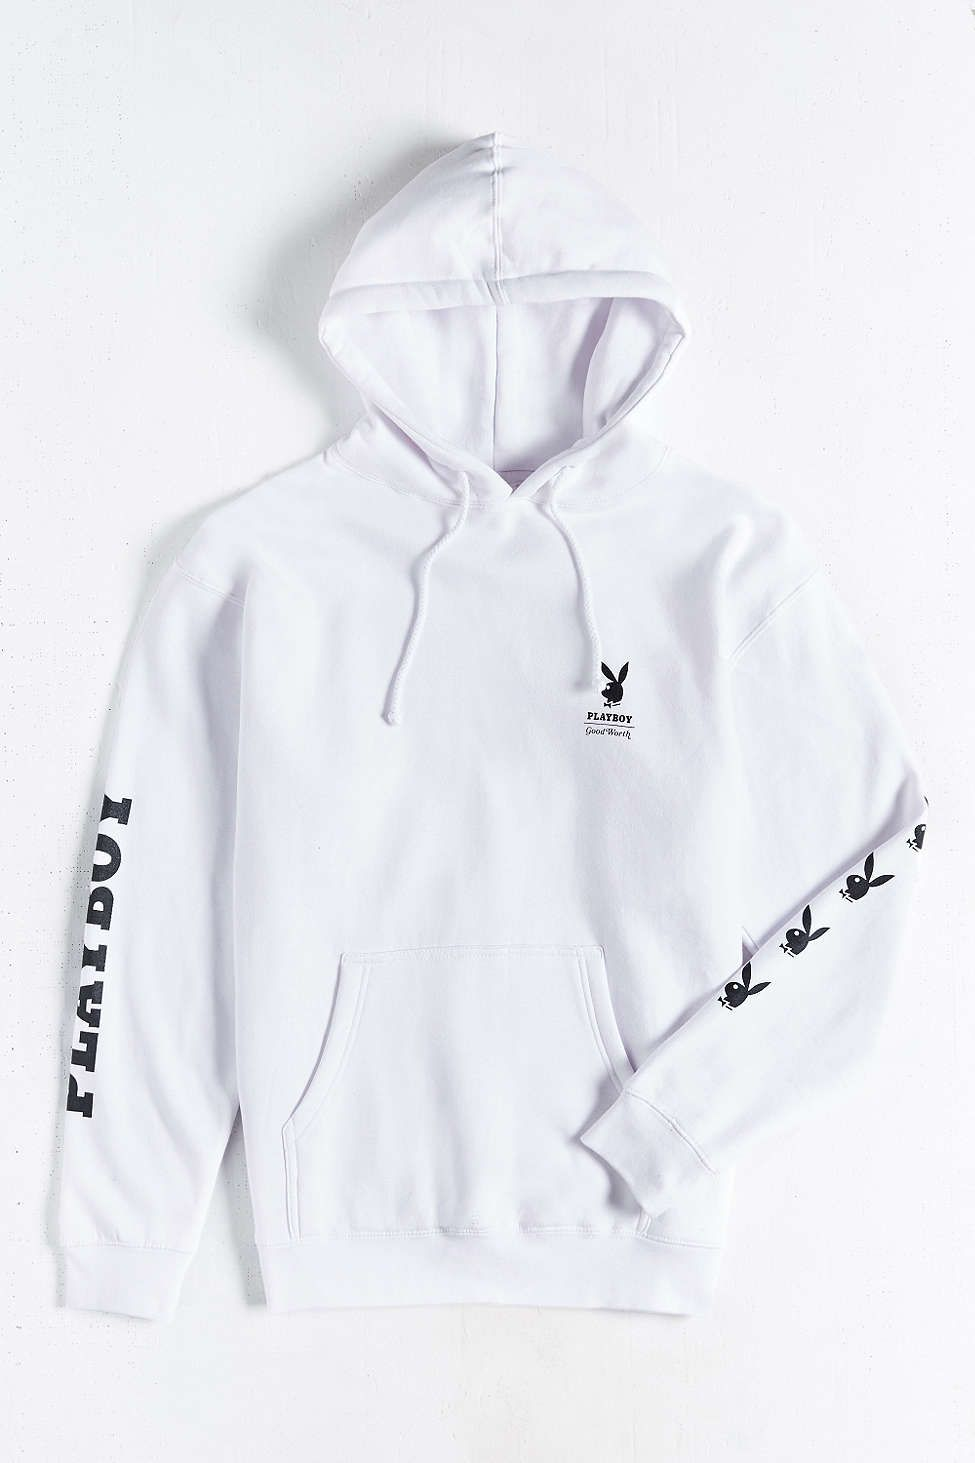 Good Worth X Playboy Bunny Hooded Sweatshirt | style | Pinterest ...